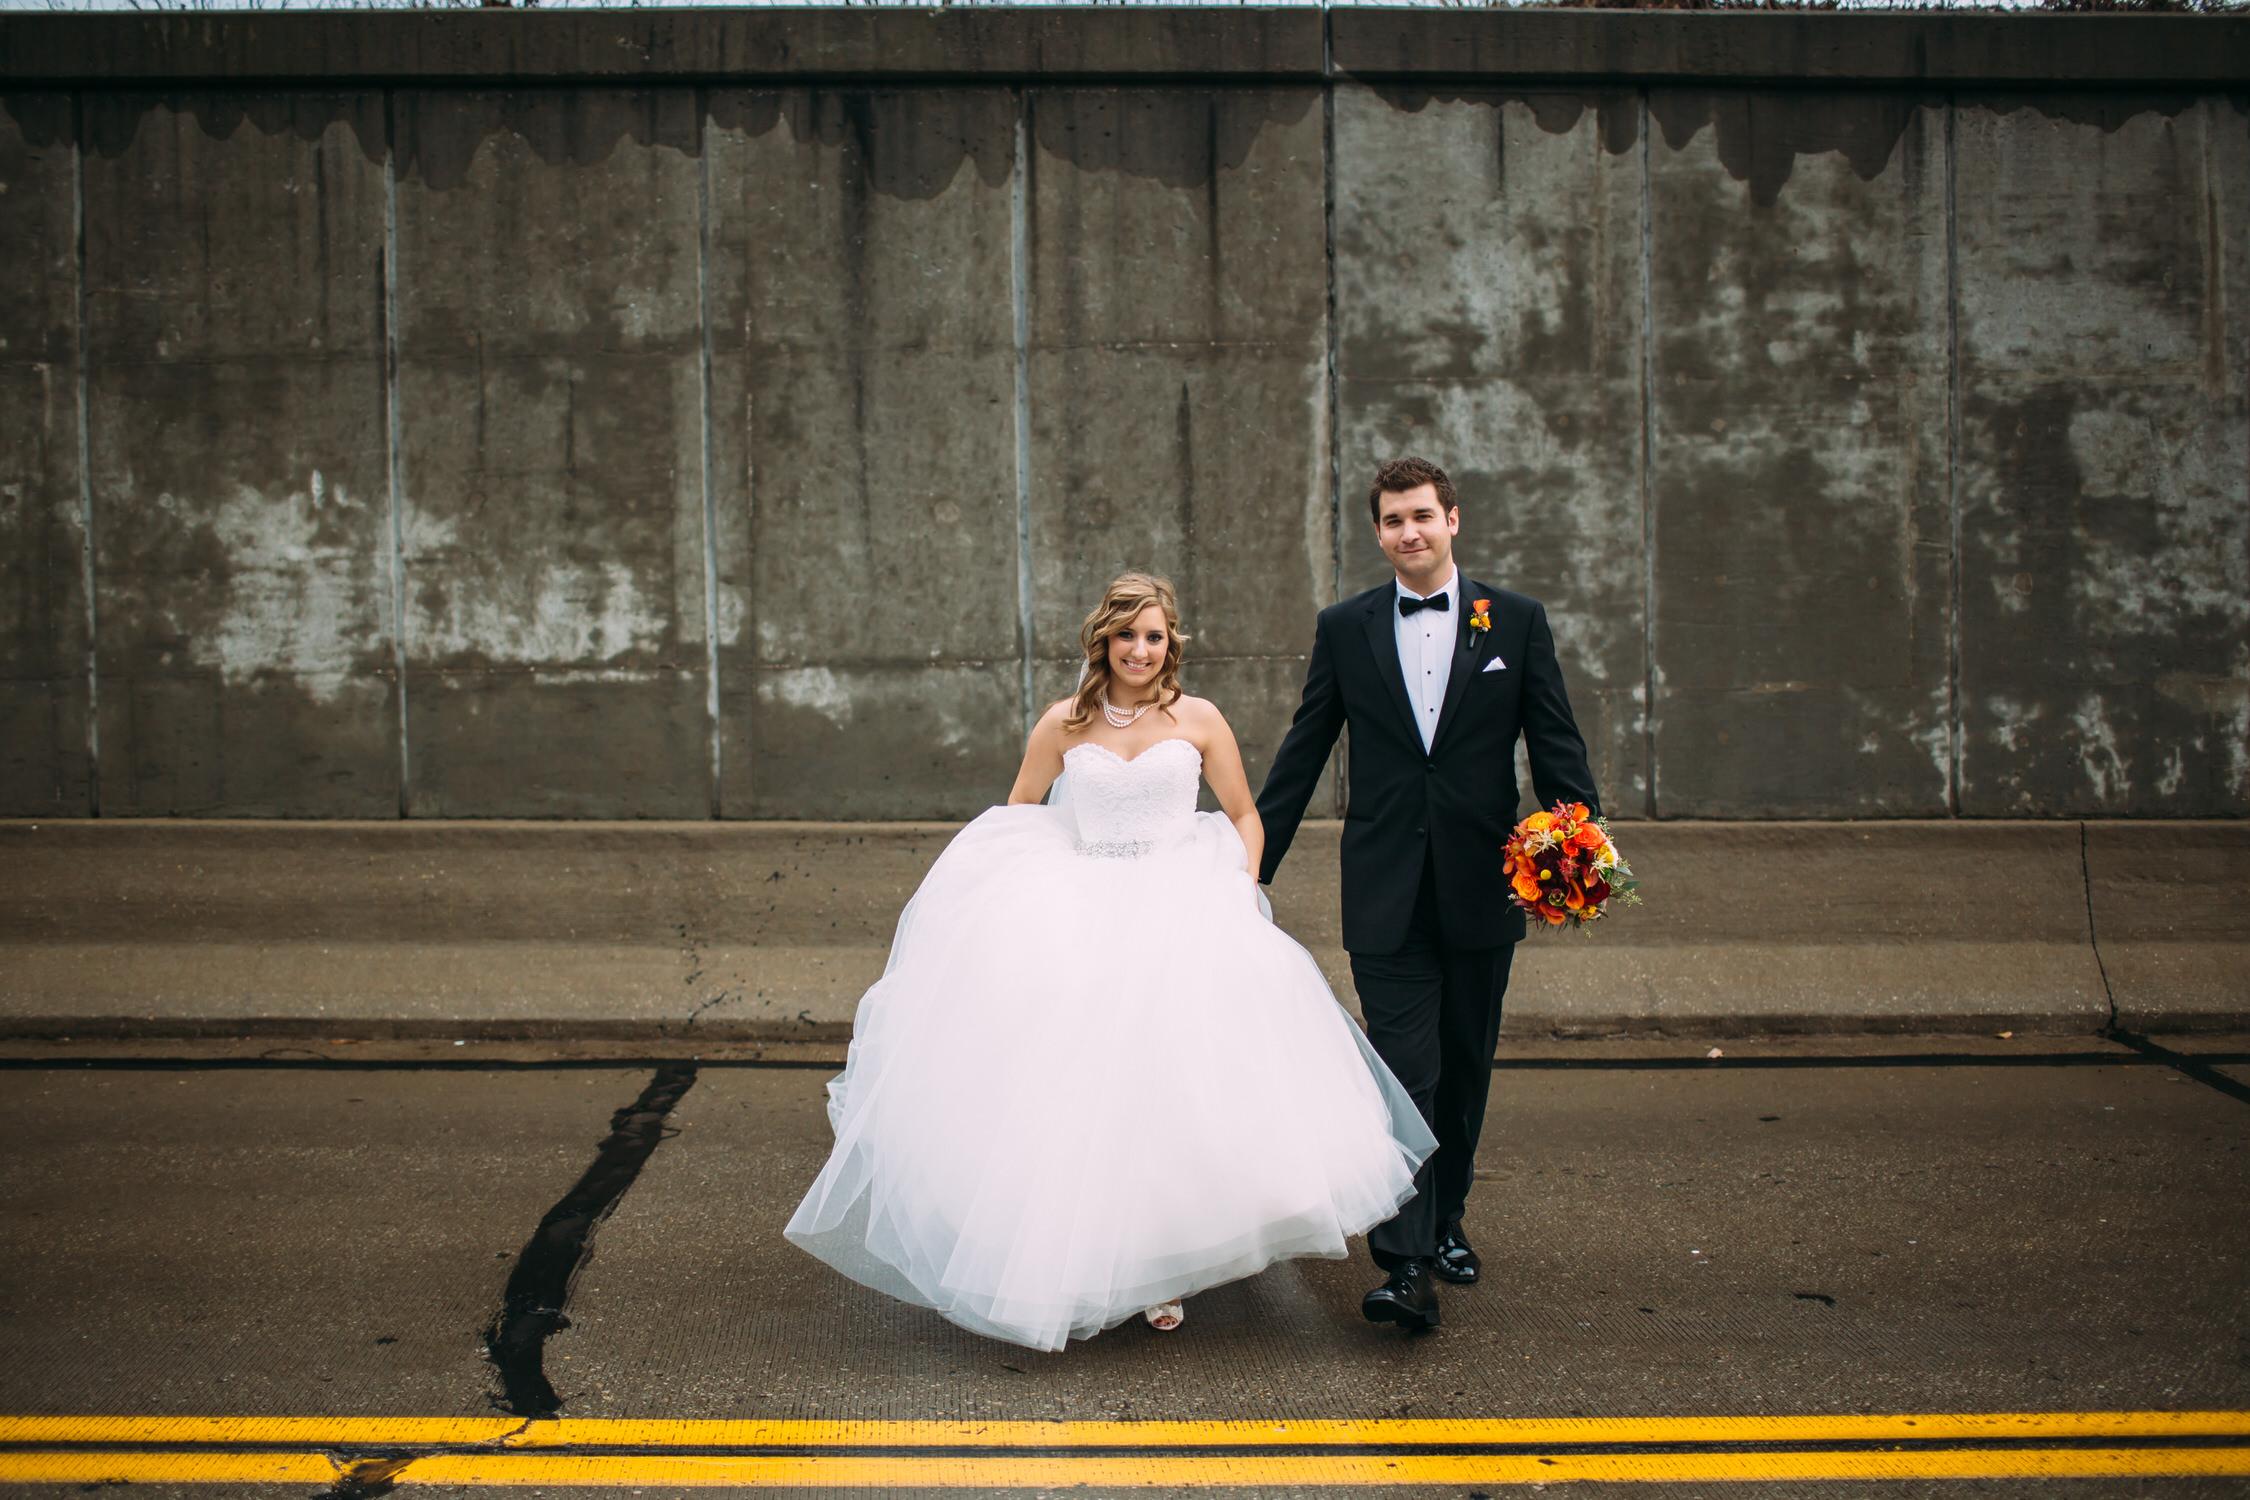 City wedding, destination wedding photographer, Salt Lake Photographer